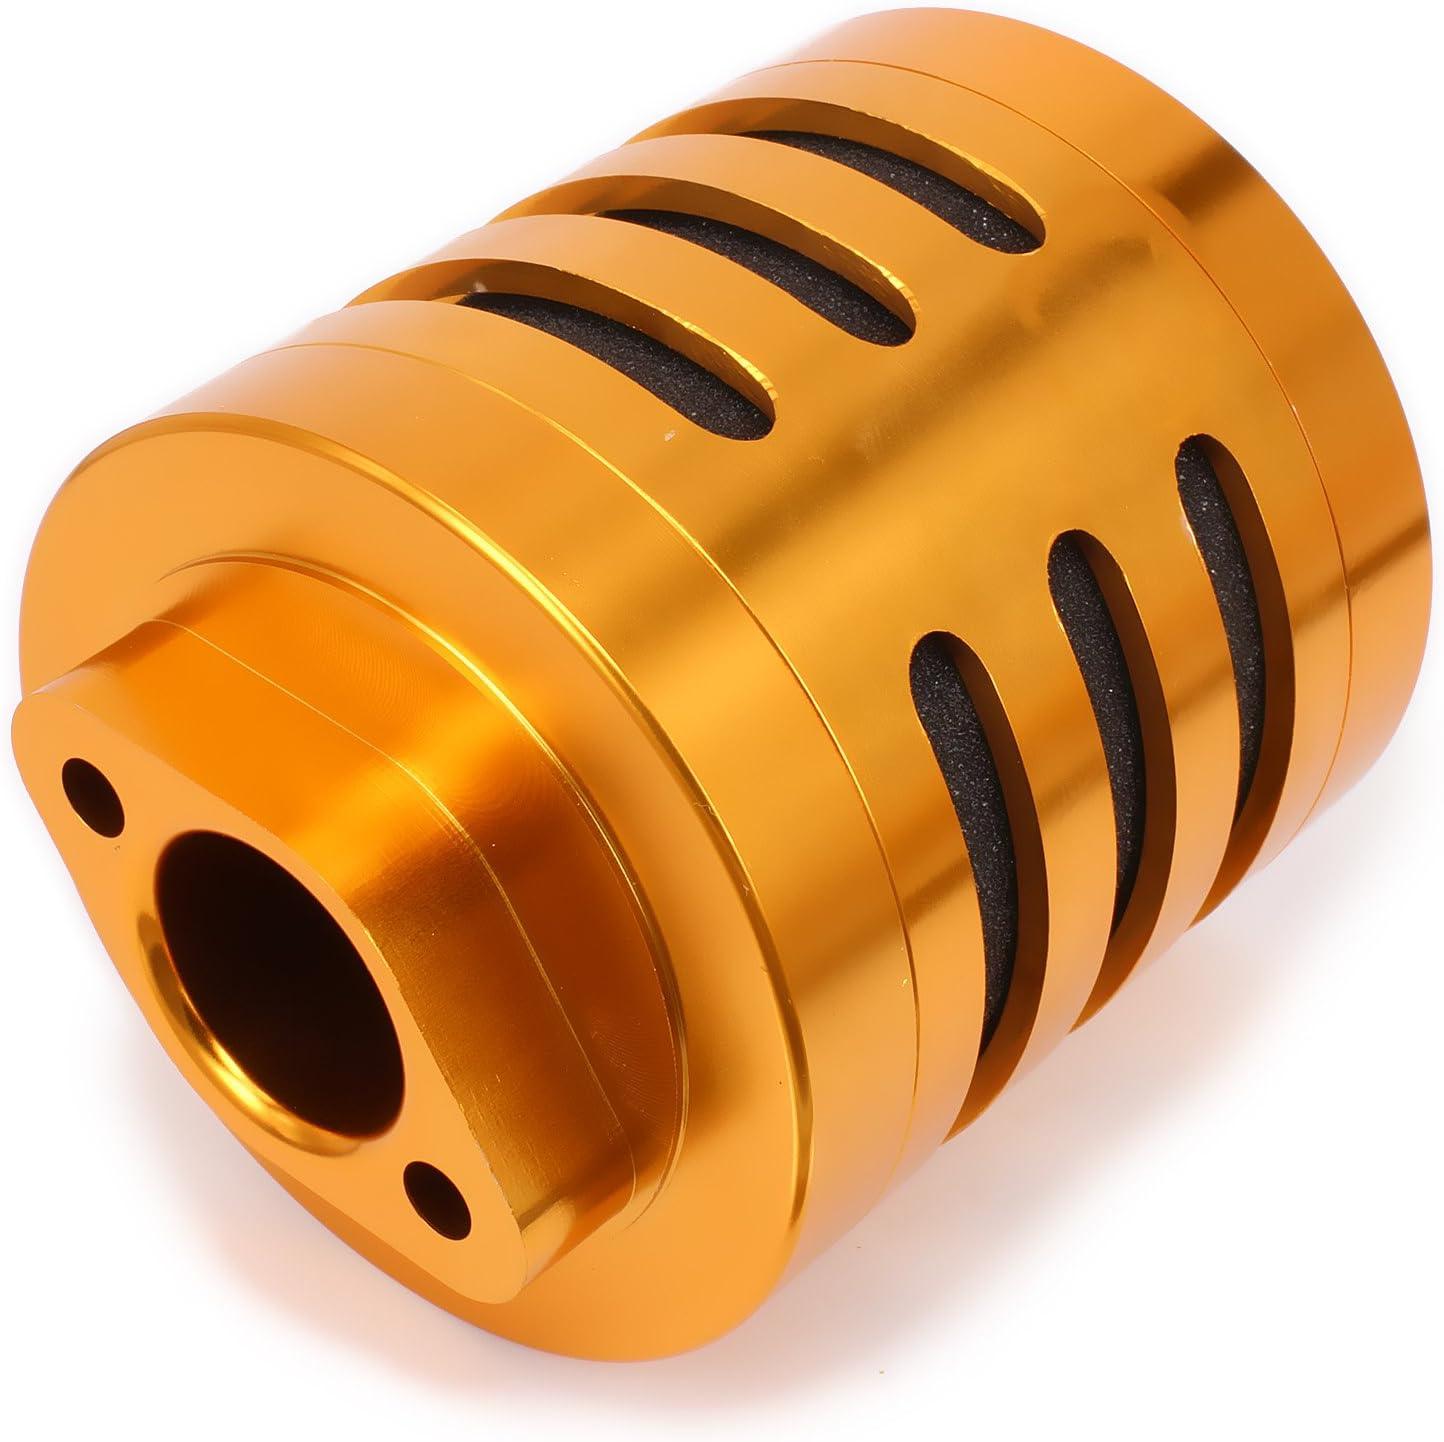 Rcawd Luftfilter N10192 Rc Alloy Aluminium Für 1 5 Hobby Modell Gas Benzin Benzin Auto Buggy Truck Upgrade Hop Up Teile Hsp Axial Hpi Traxxas Losi 1pcs Gold Küche Haushalt